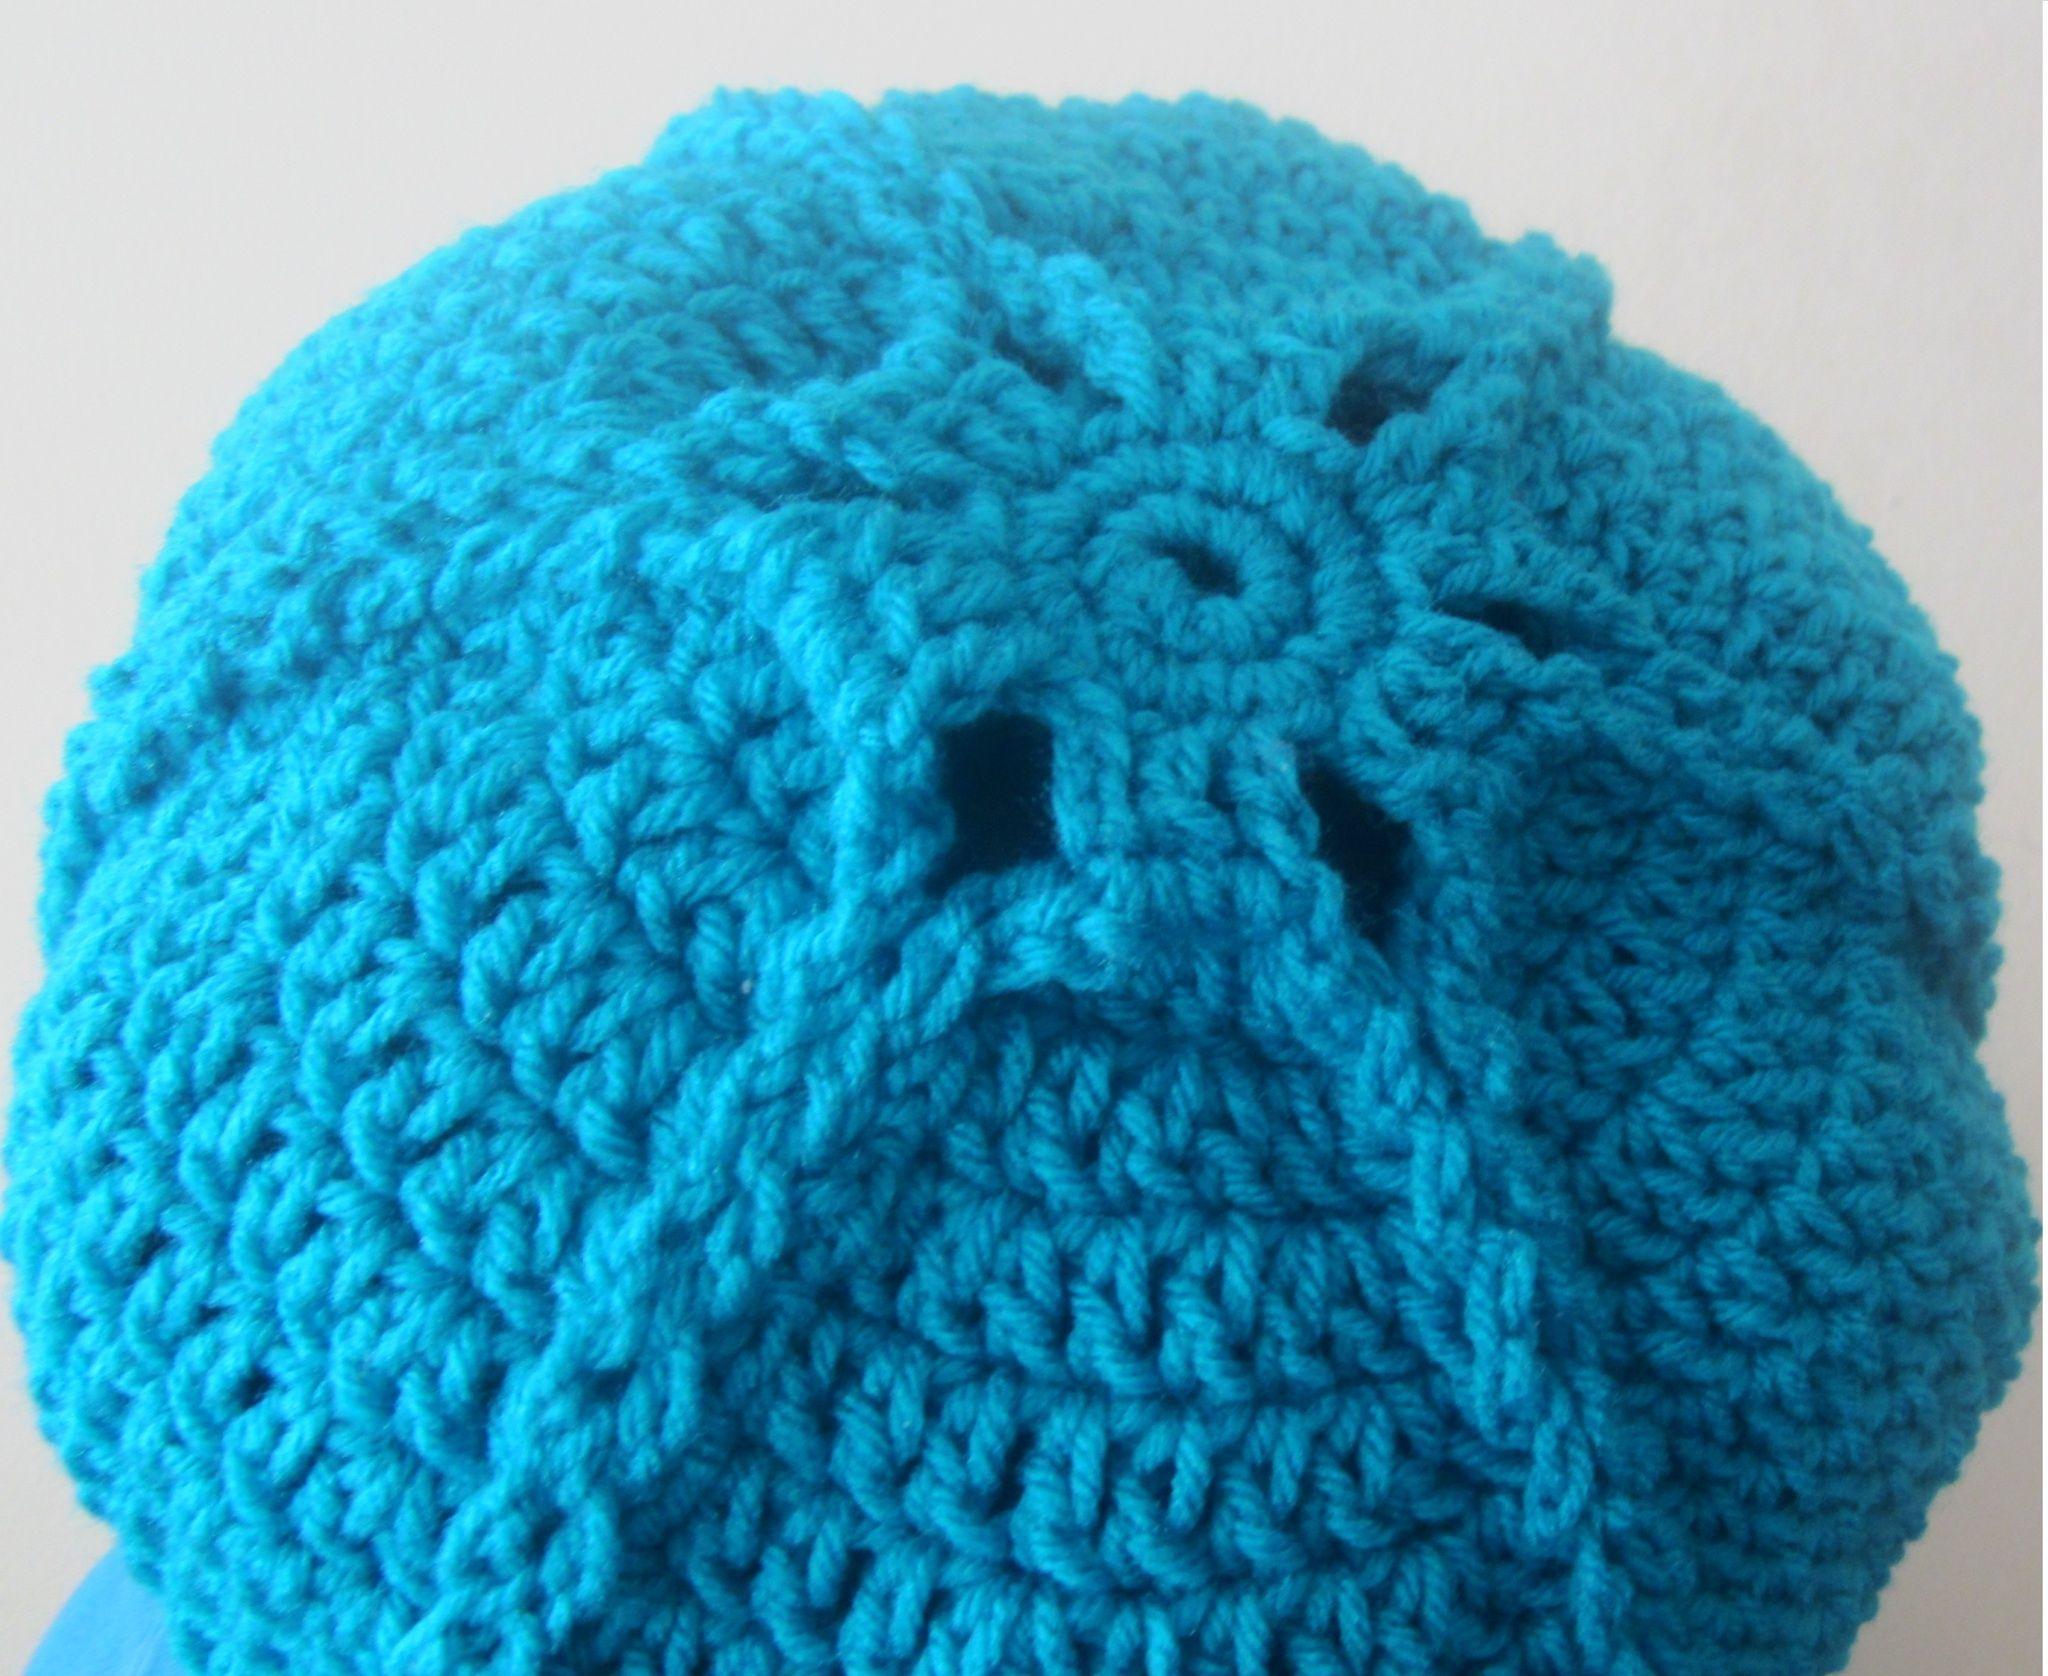 Pin by Jazmin Rew-Pinchem on Crochet Pinterest